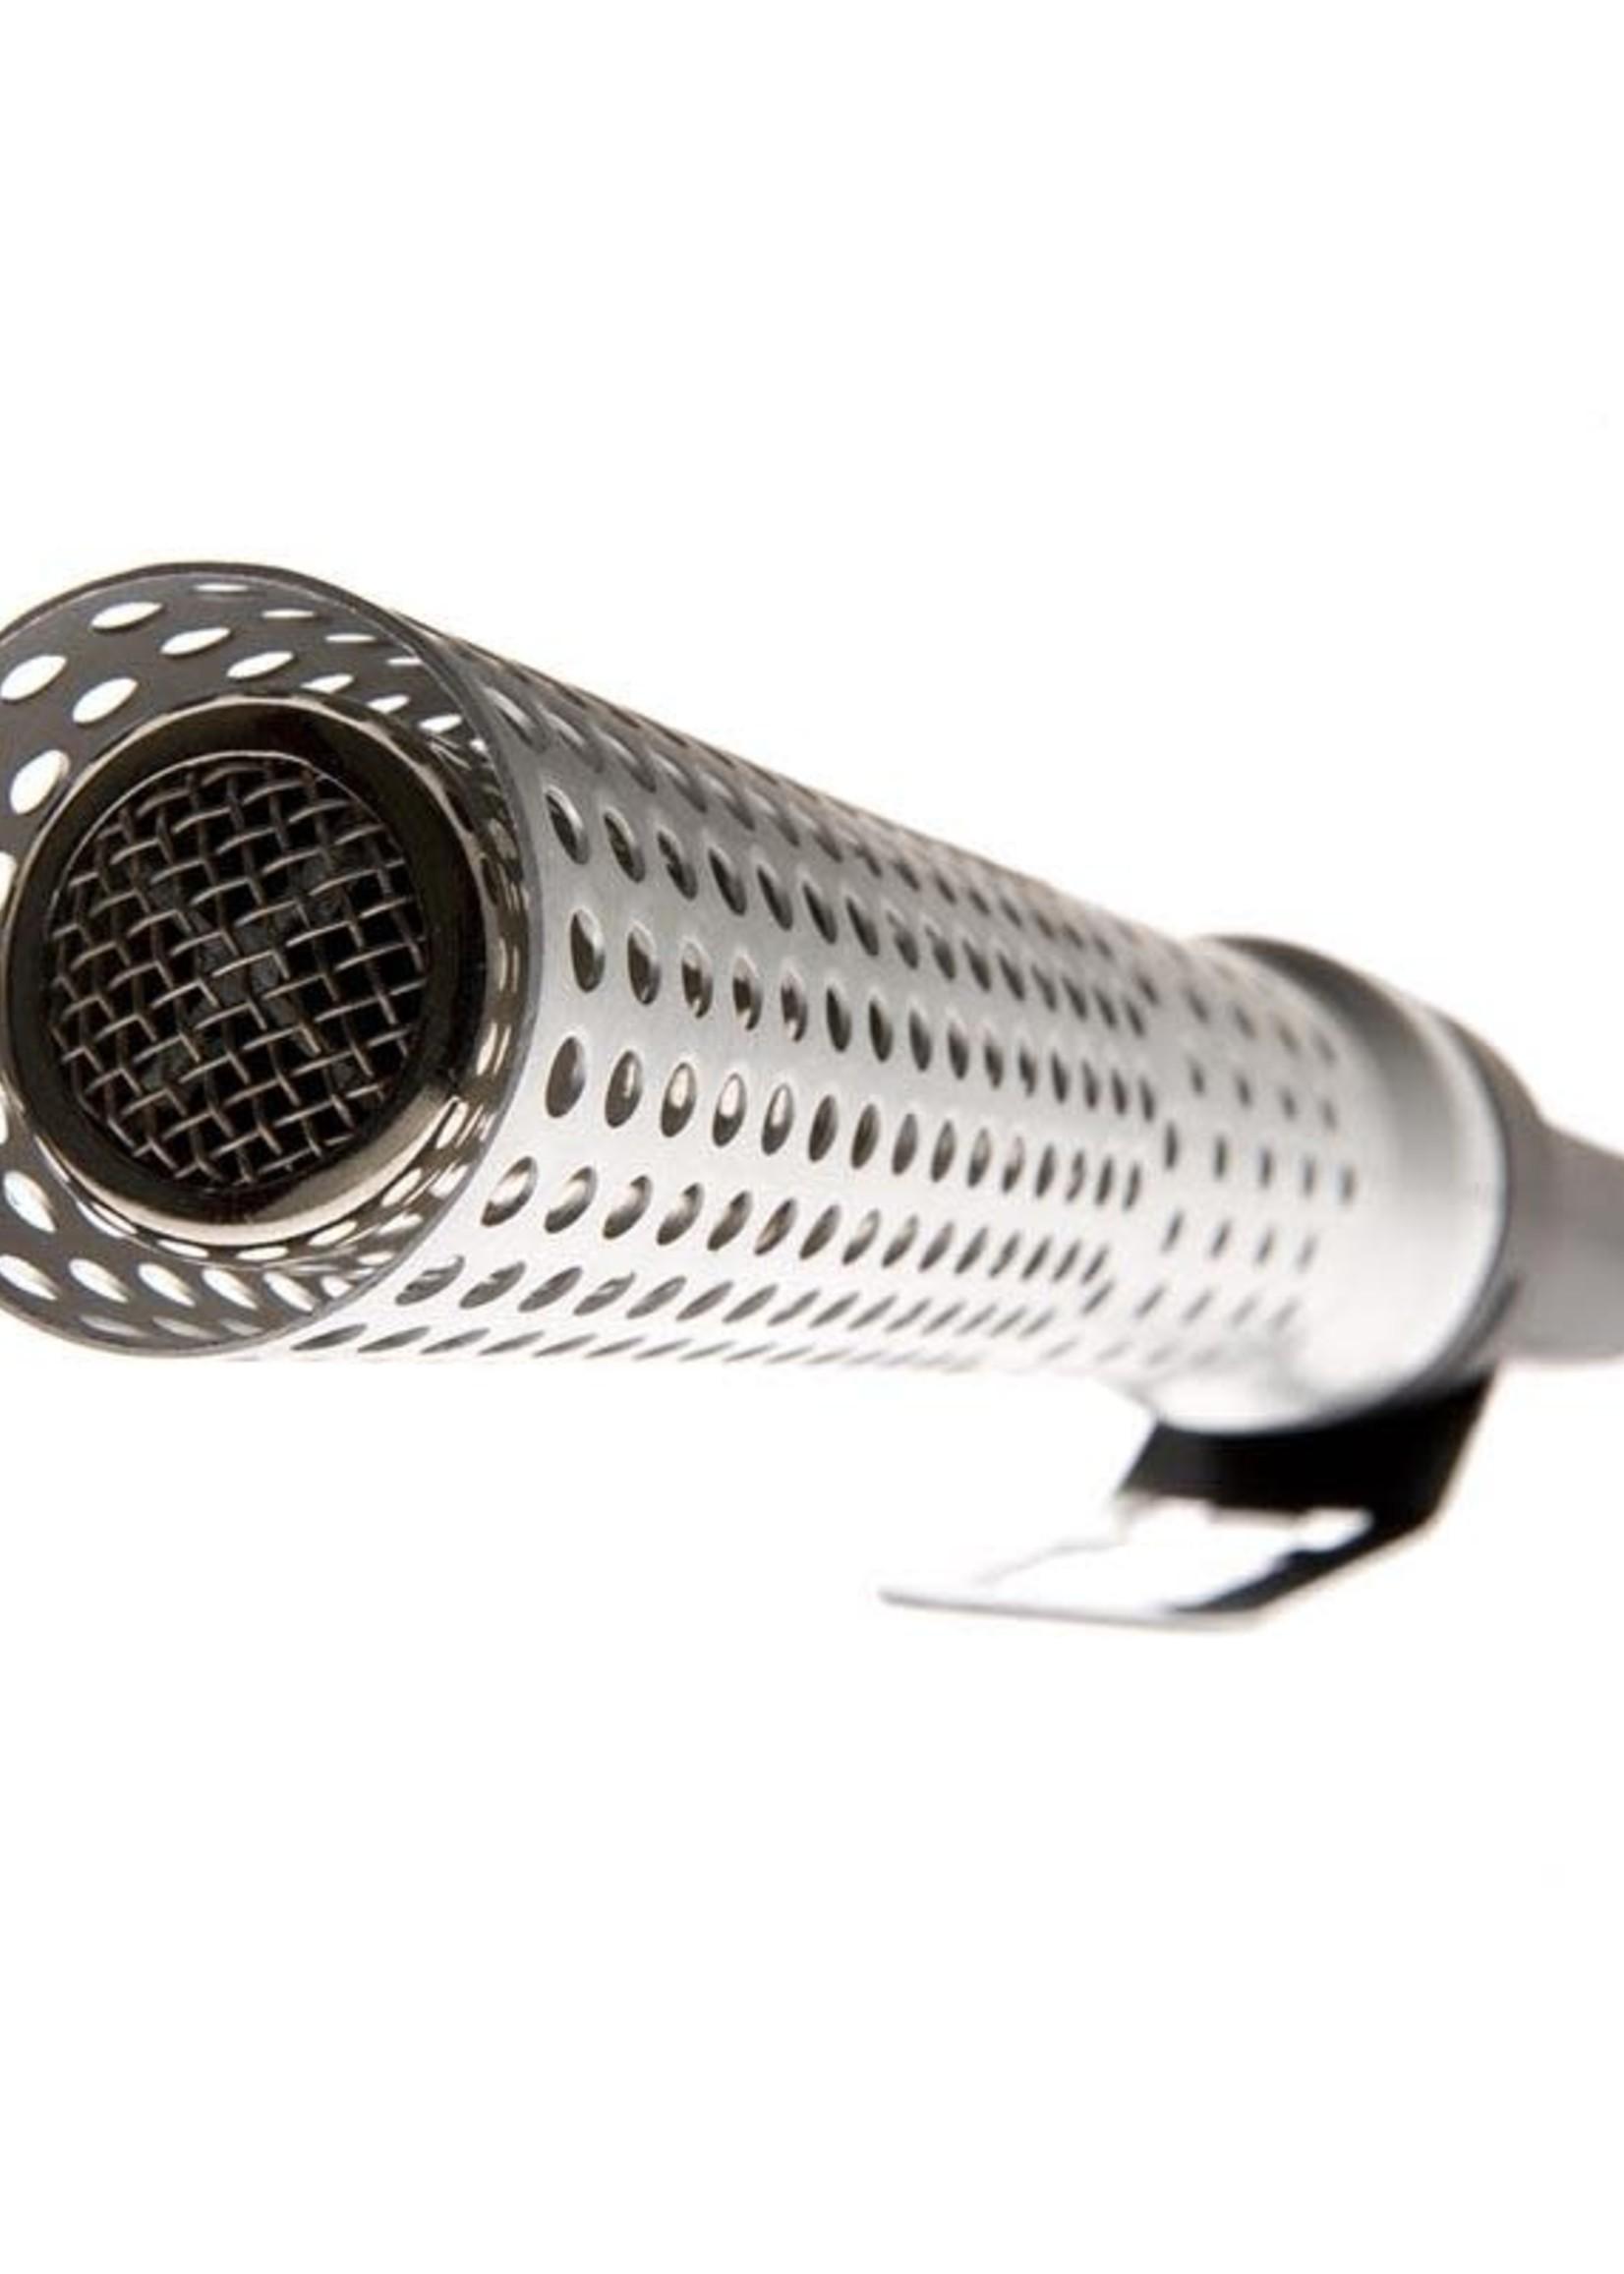 Looft Looft Lighter 1